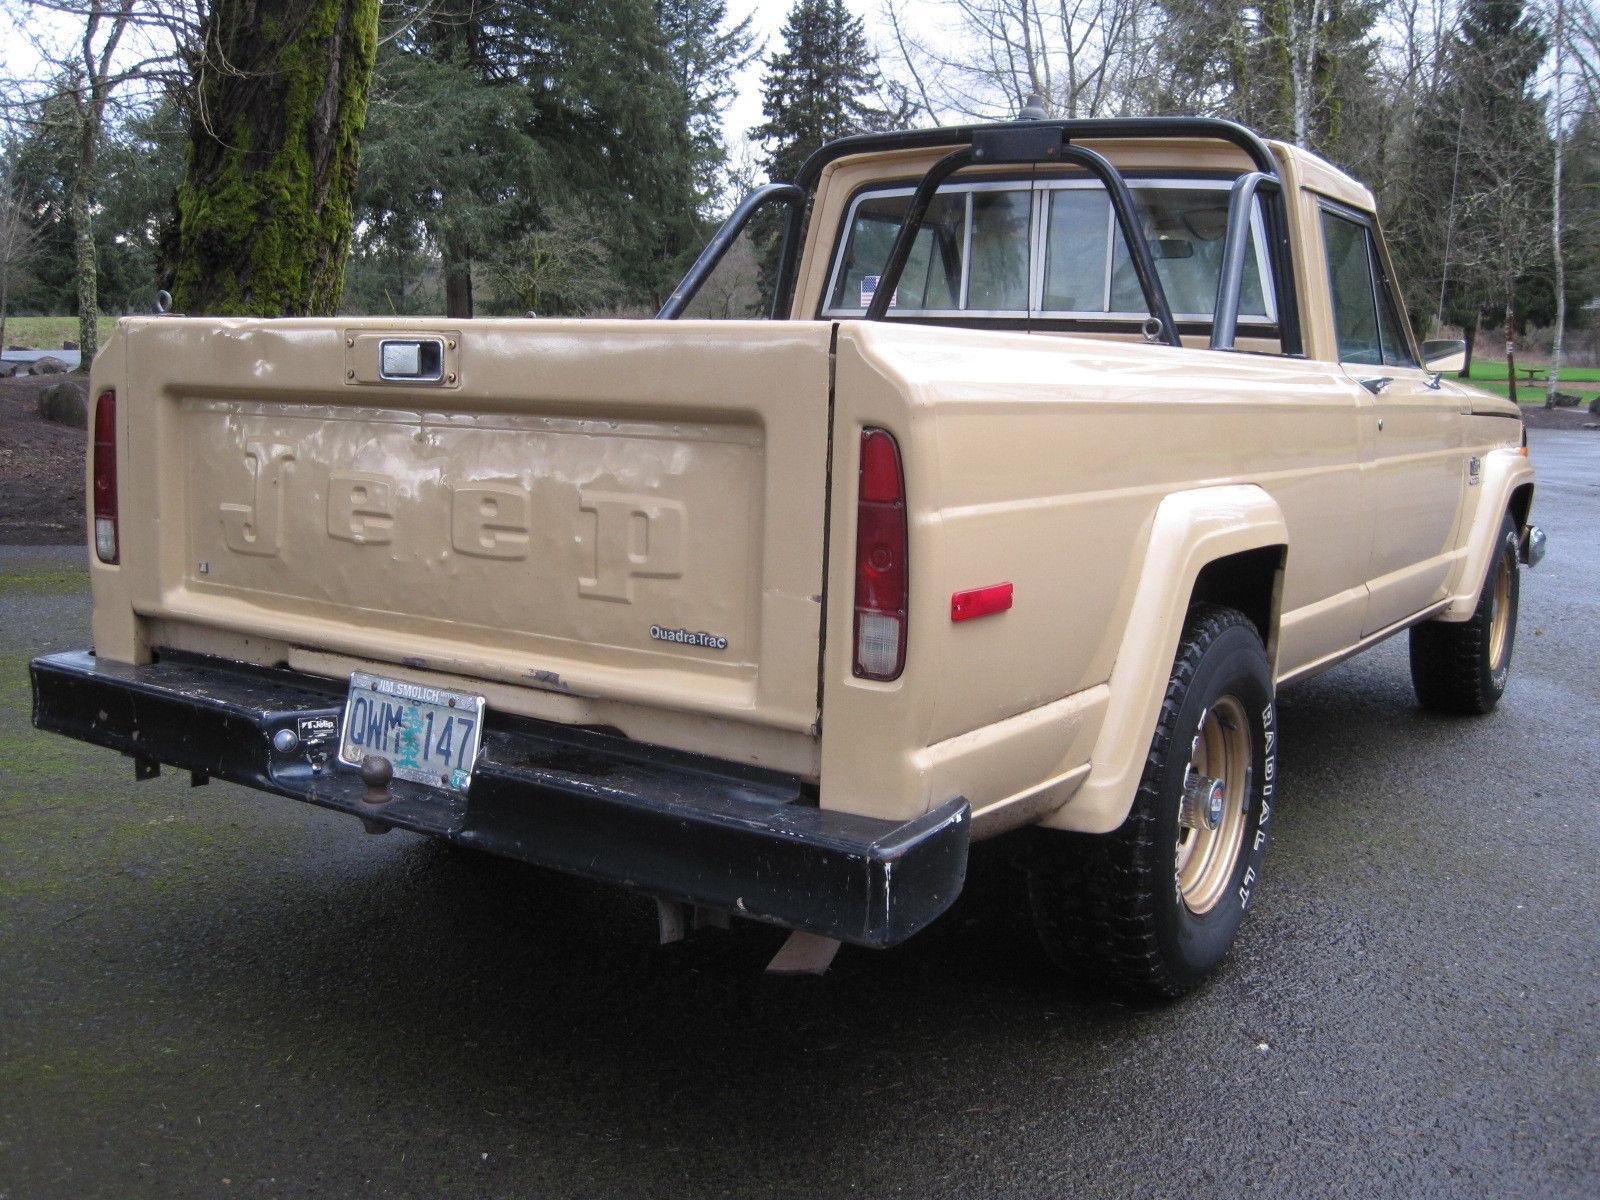 jeep 1978 j10 j10 golden eagle 401 shortbed 4x4 rust free